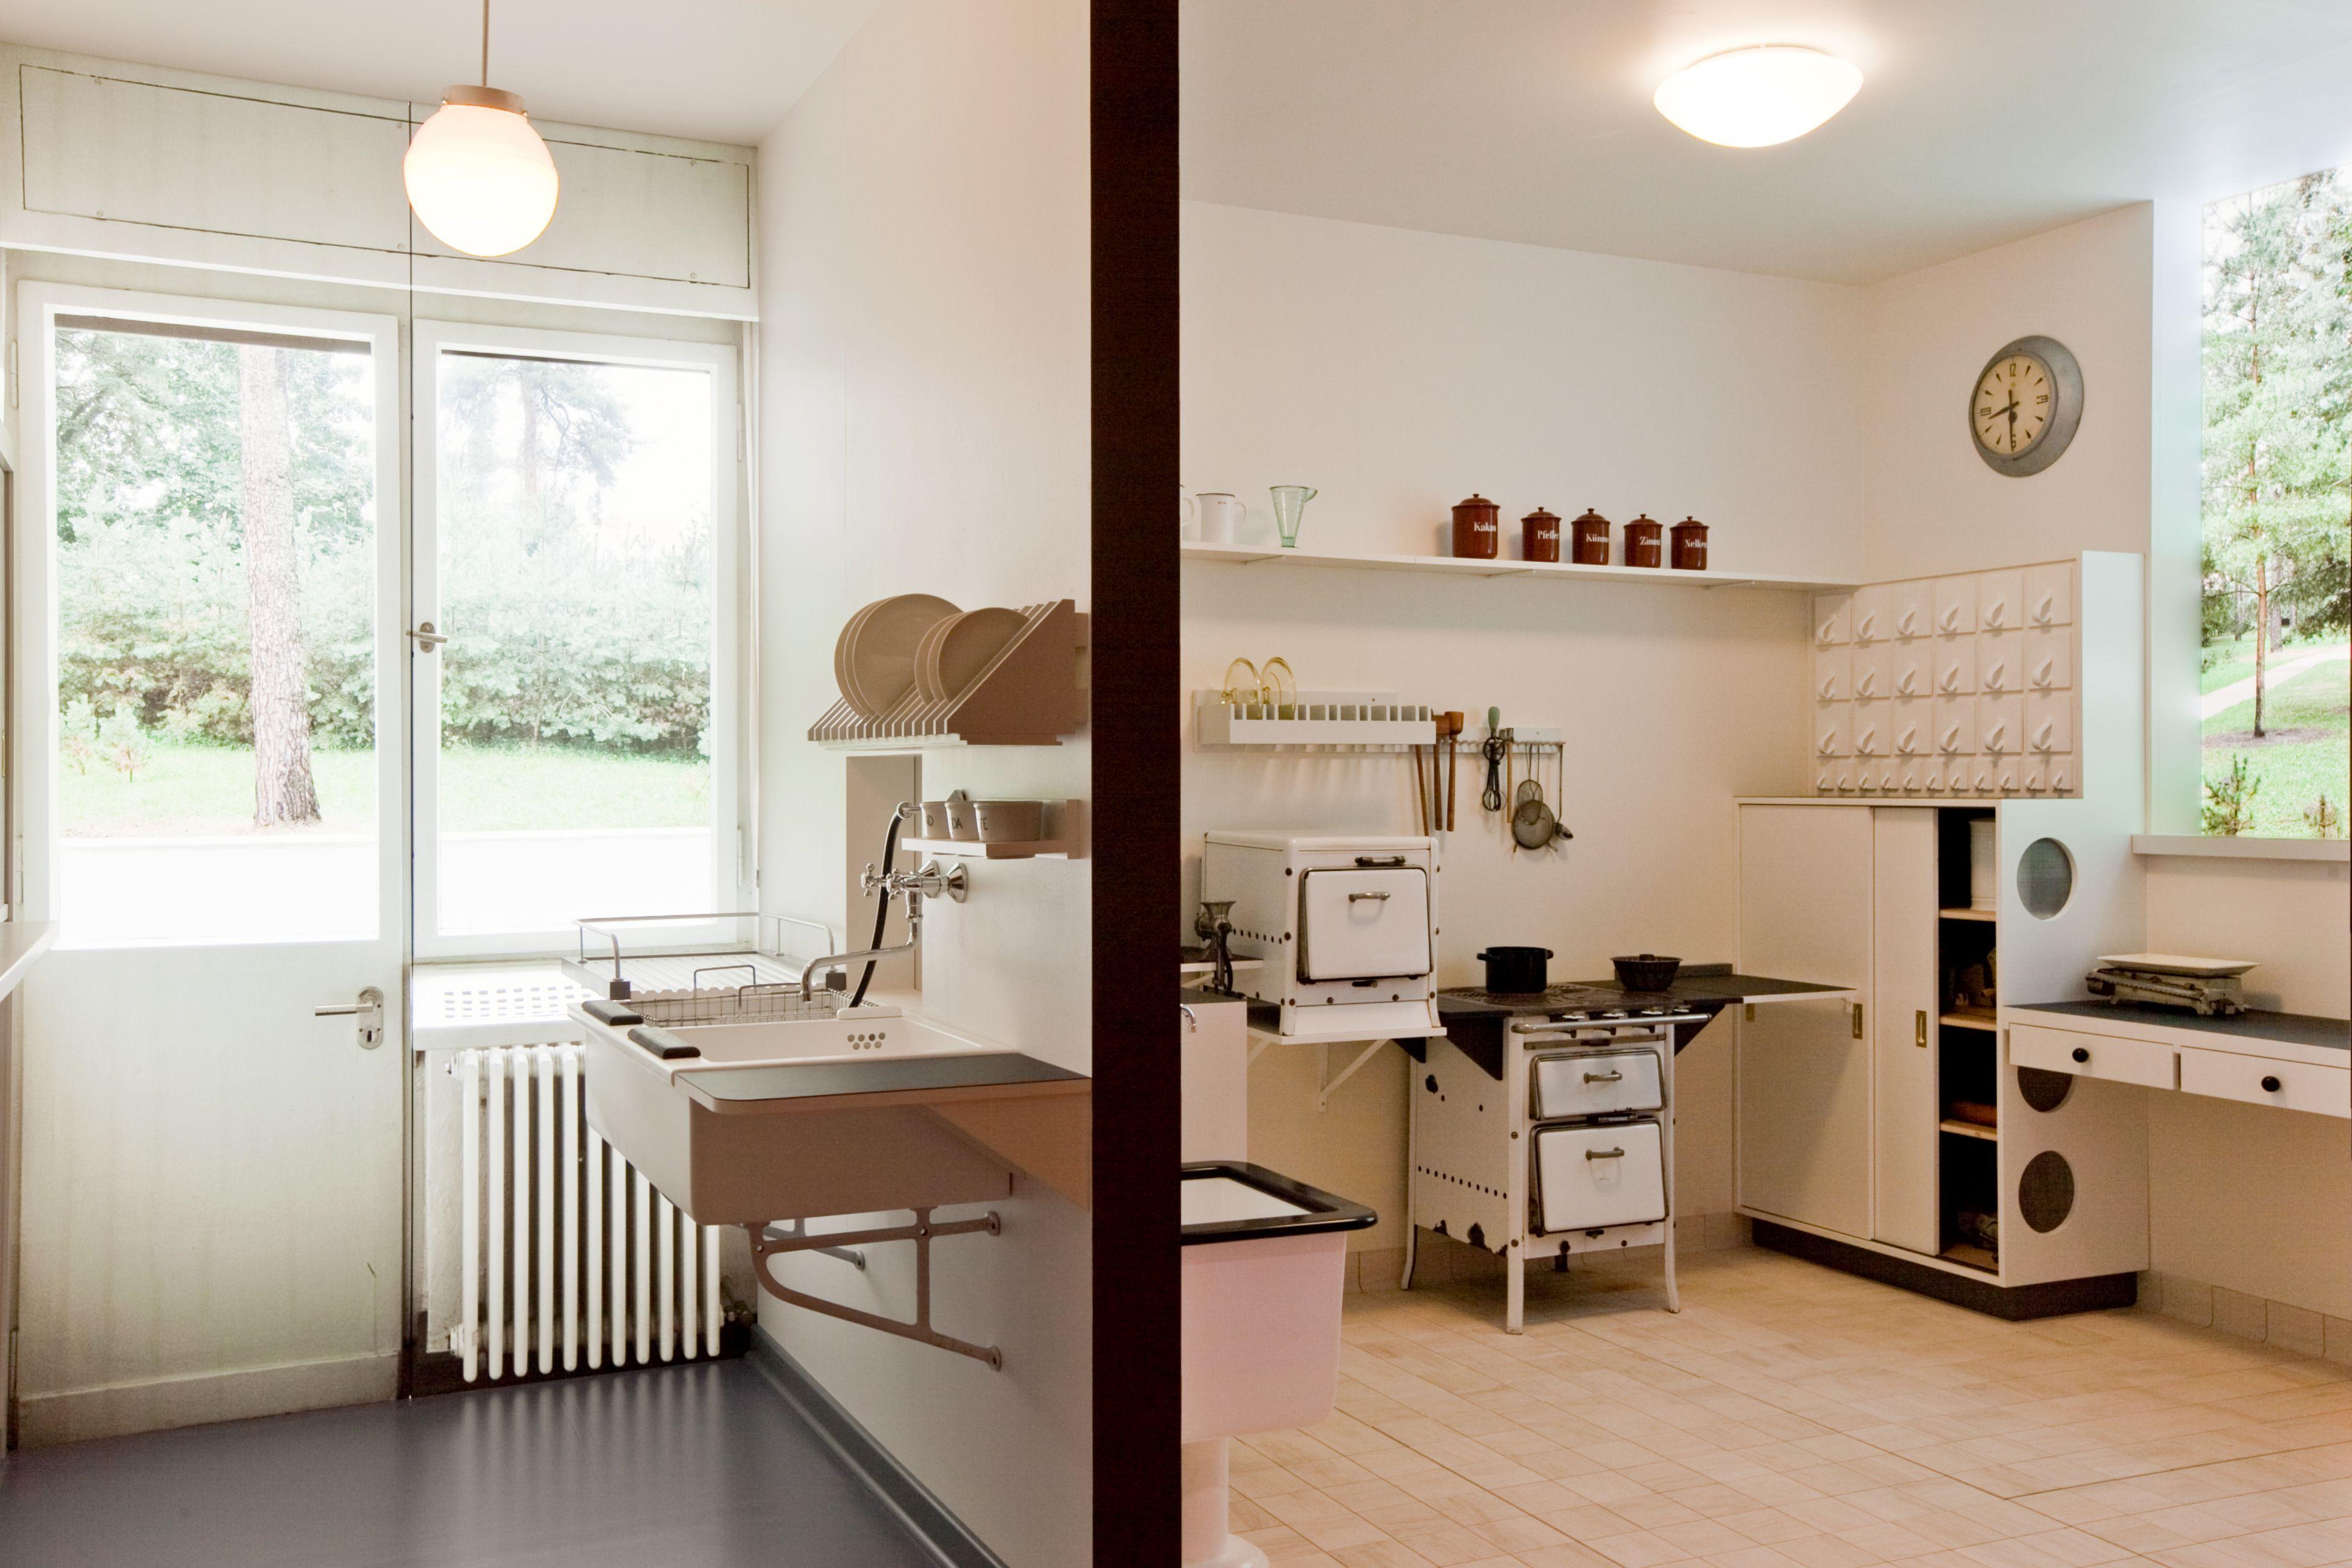 bauhaus kitchen Google Search Bauhaus interior